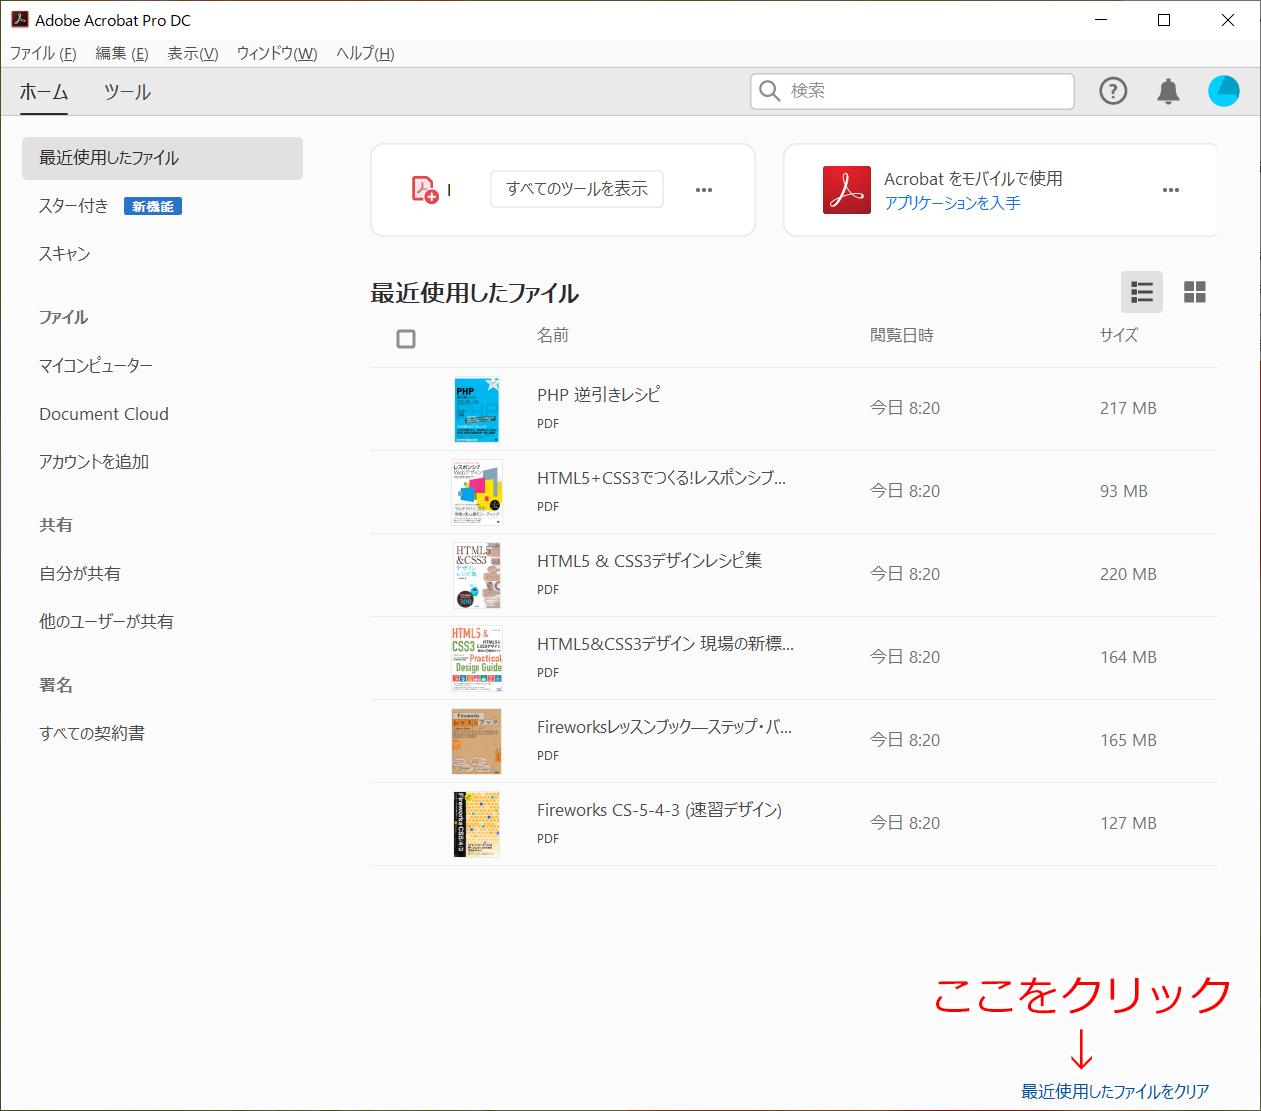 Acrobat Reader / Adobe Acrobat最近使ったファイルを消す